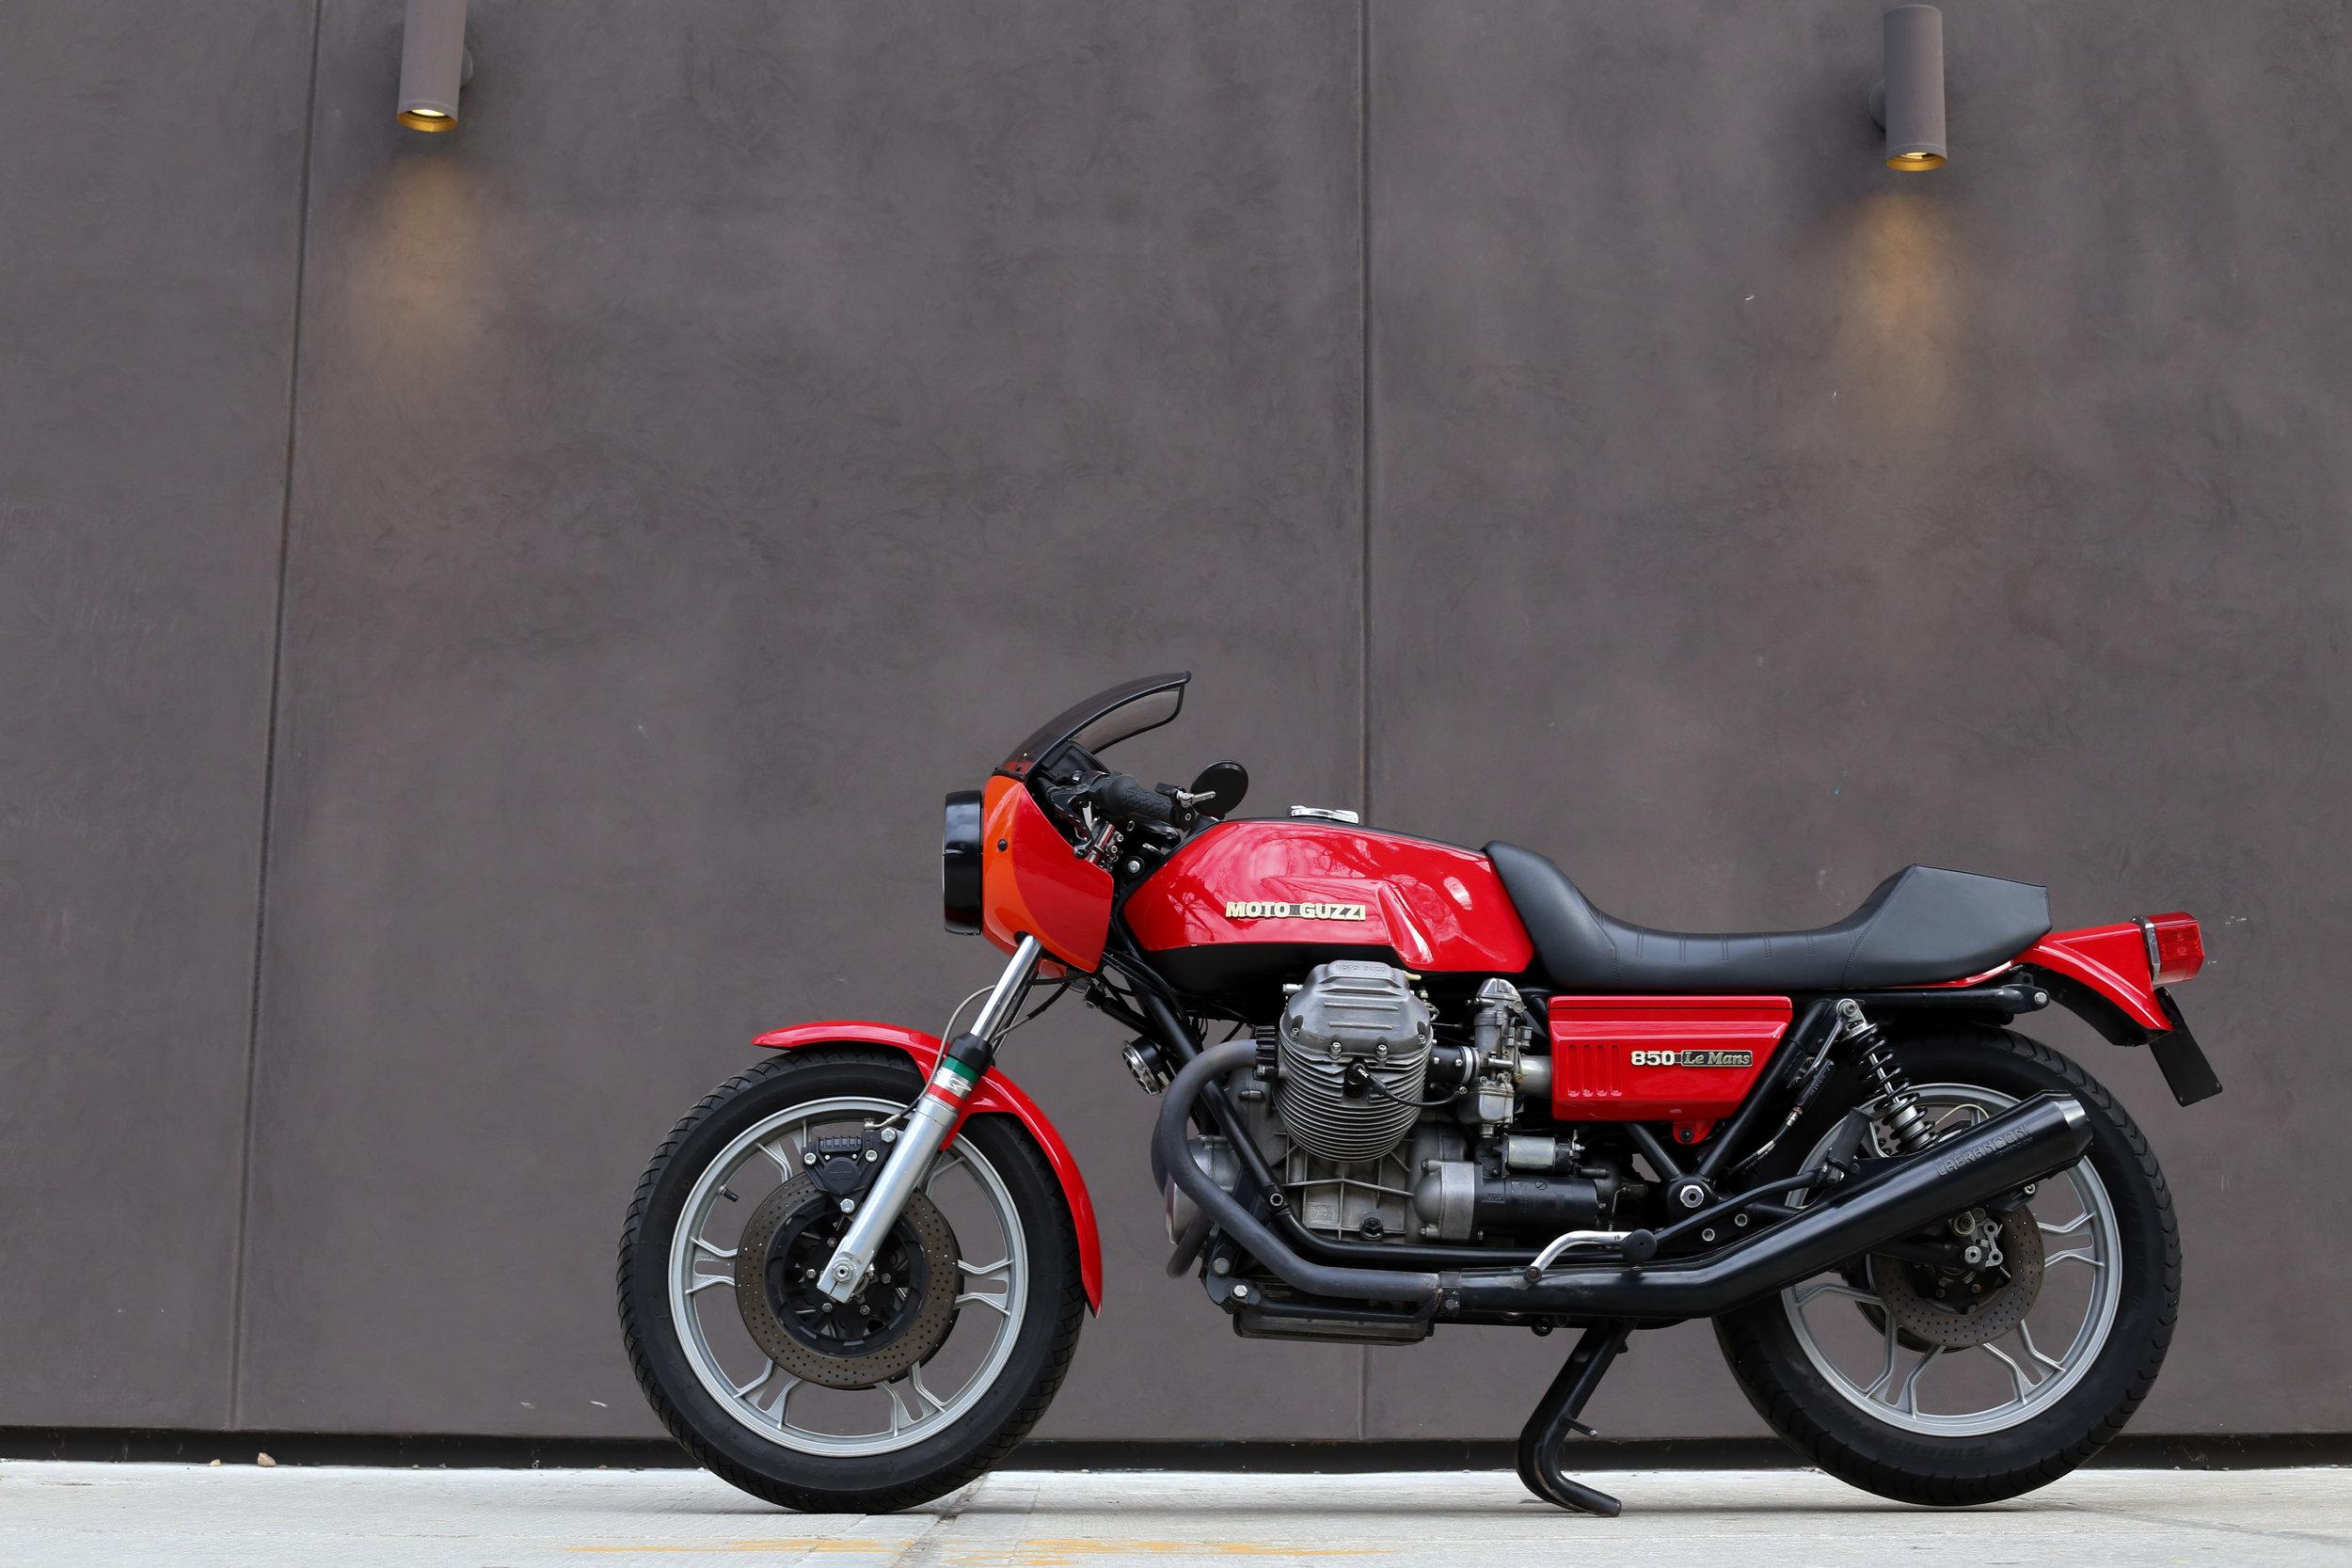 1976 Moto Guzzi Le mans 1